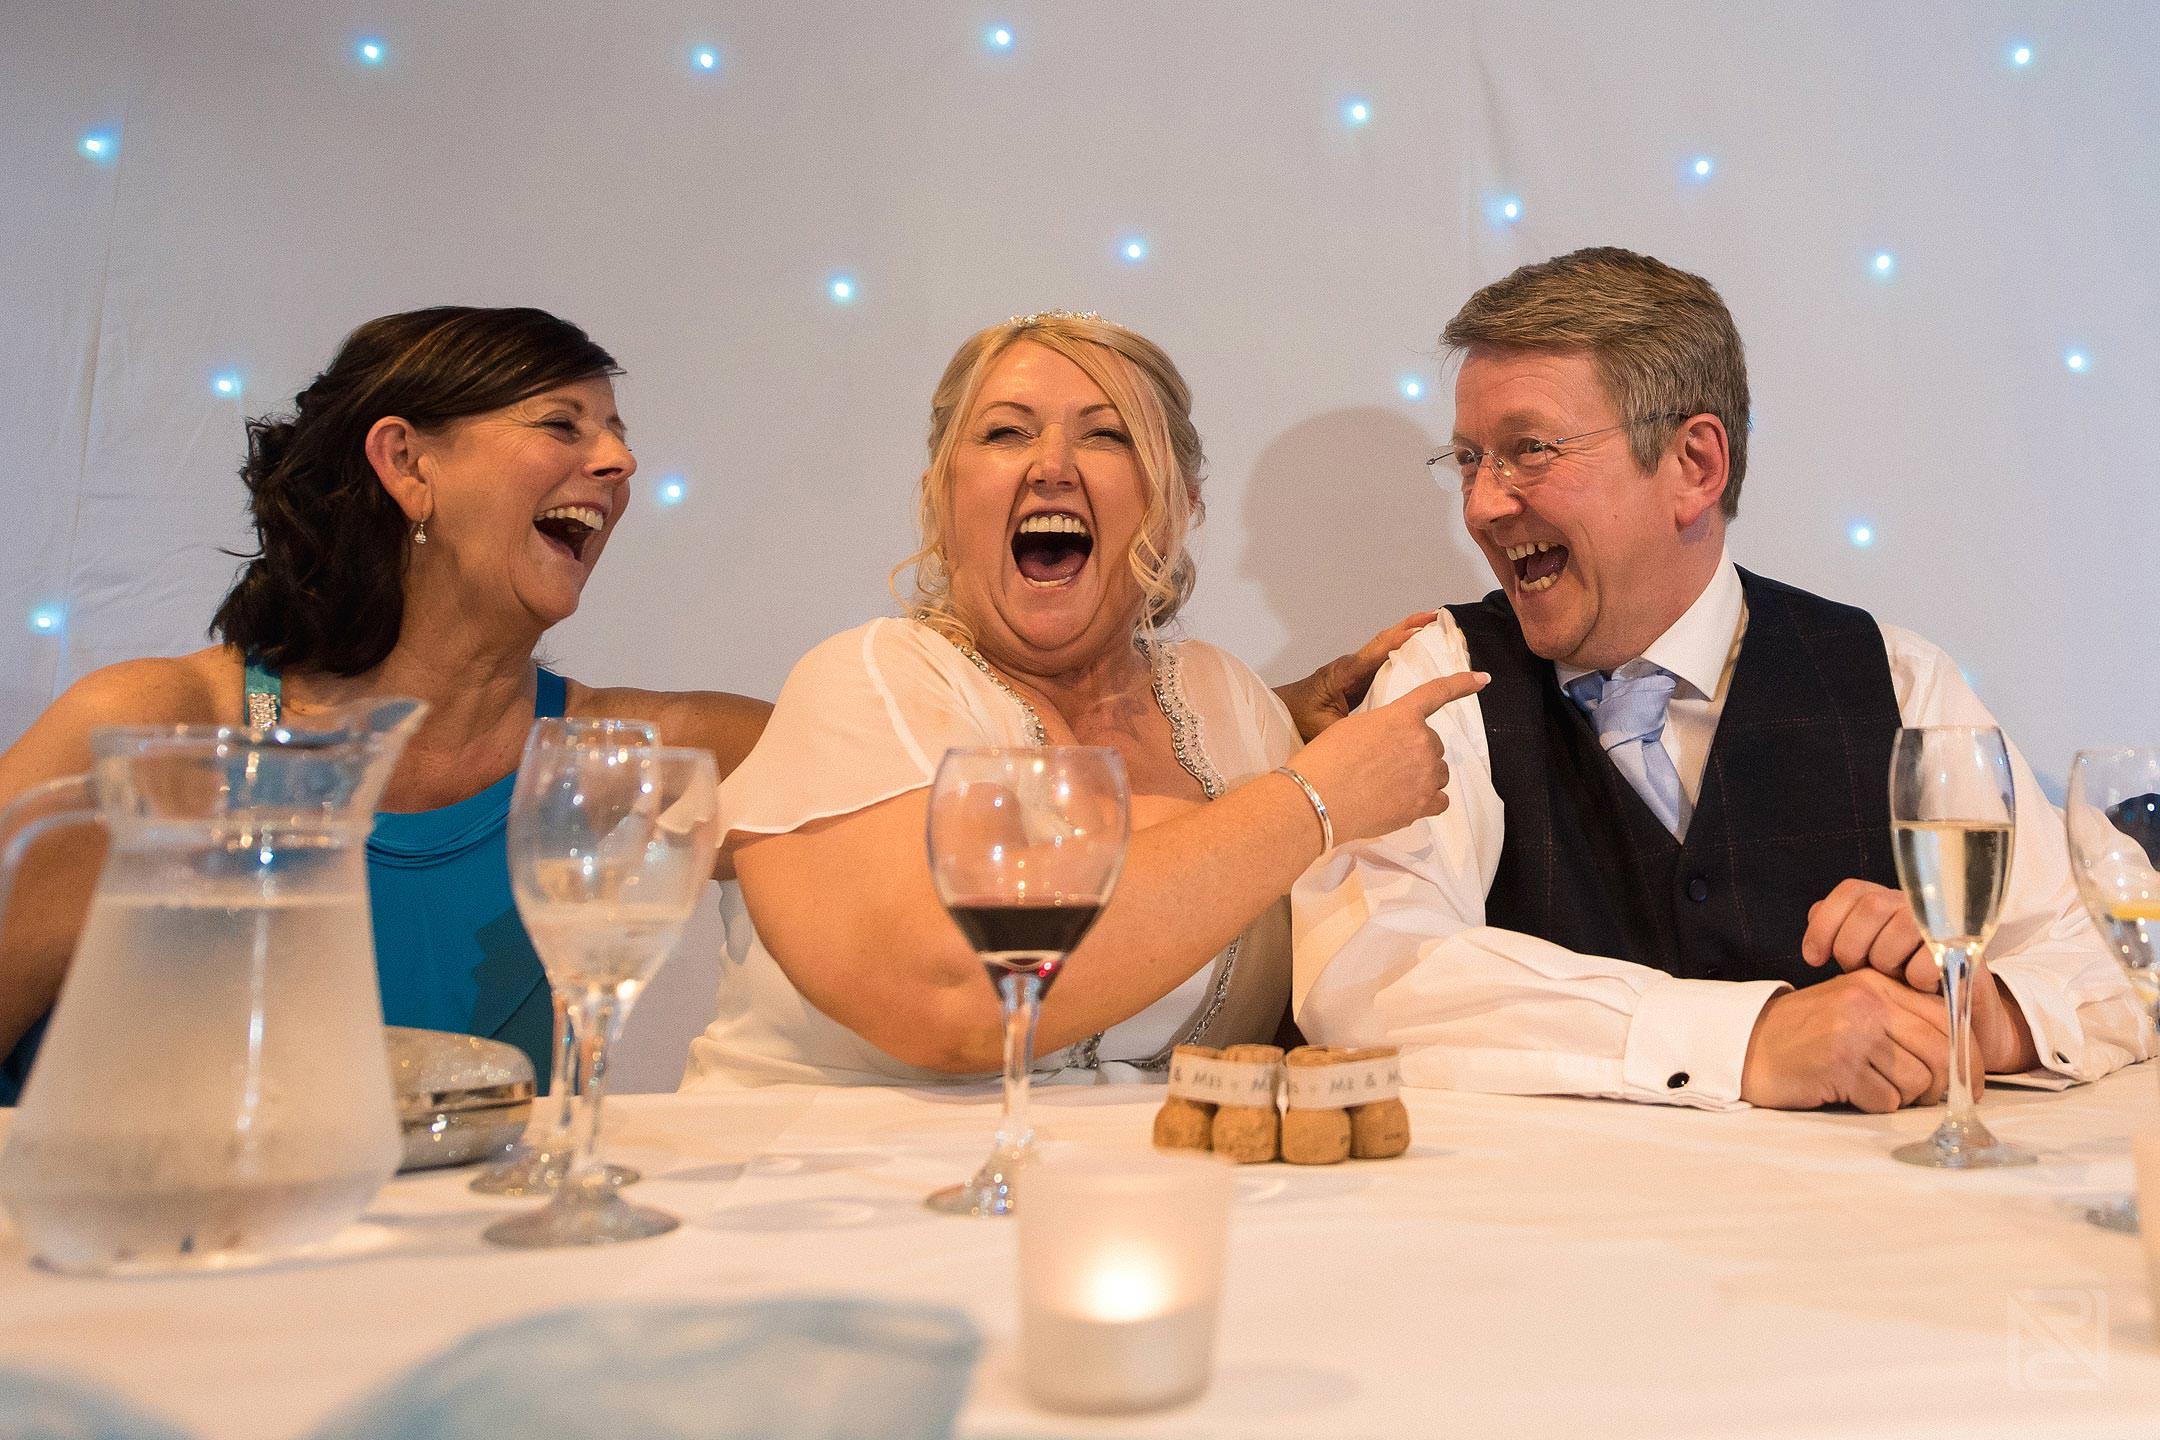 best-wedding-photographs-2015-052